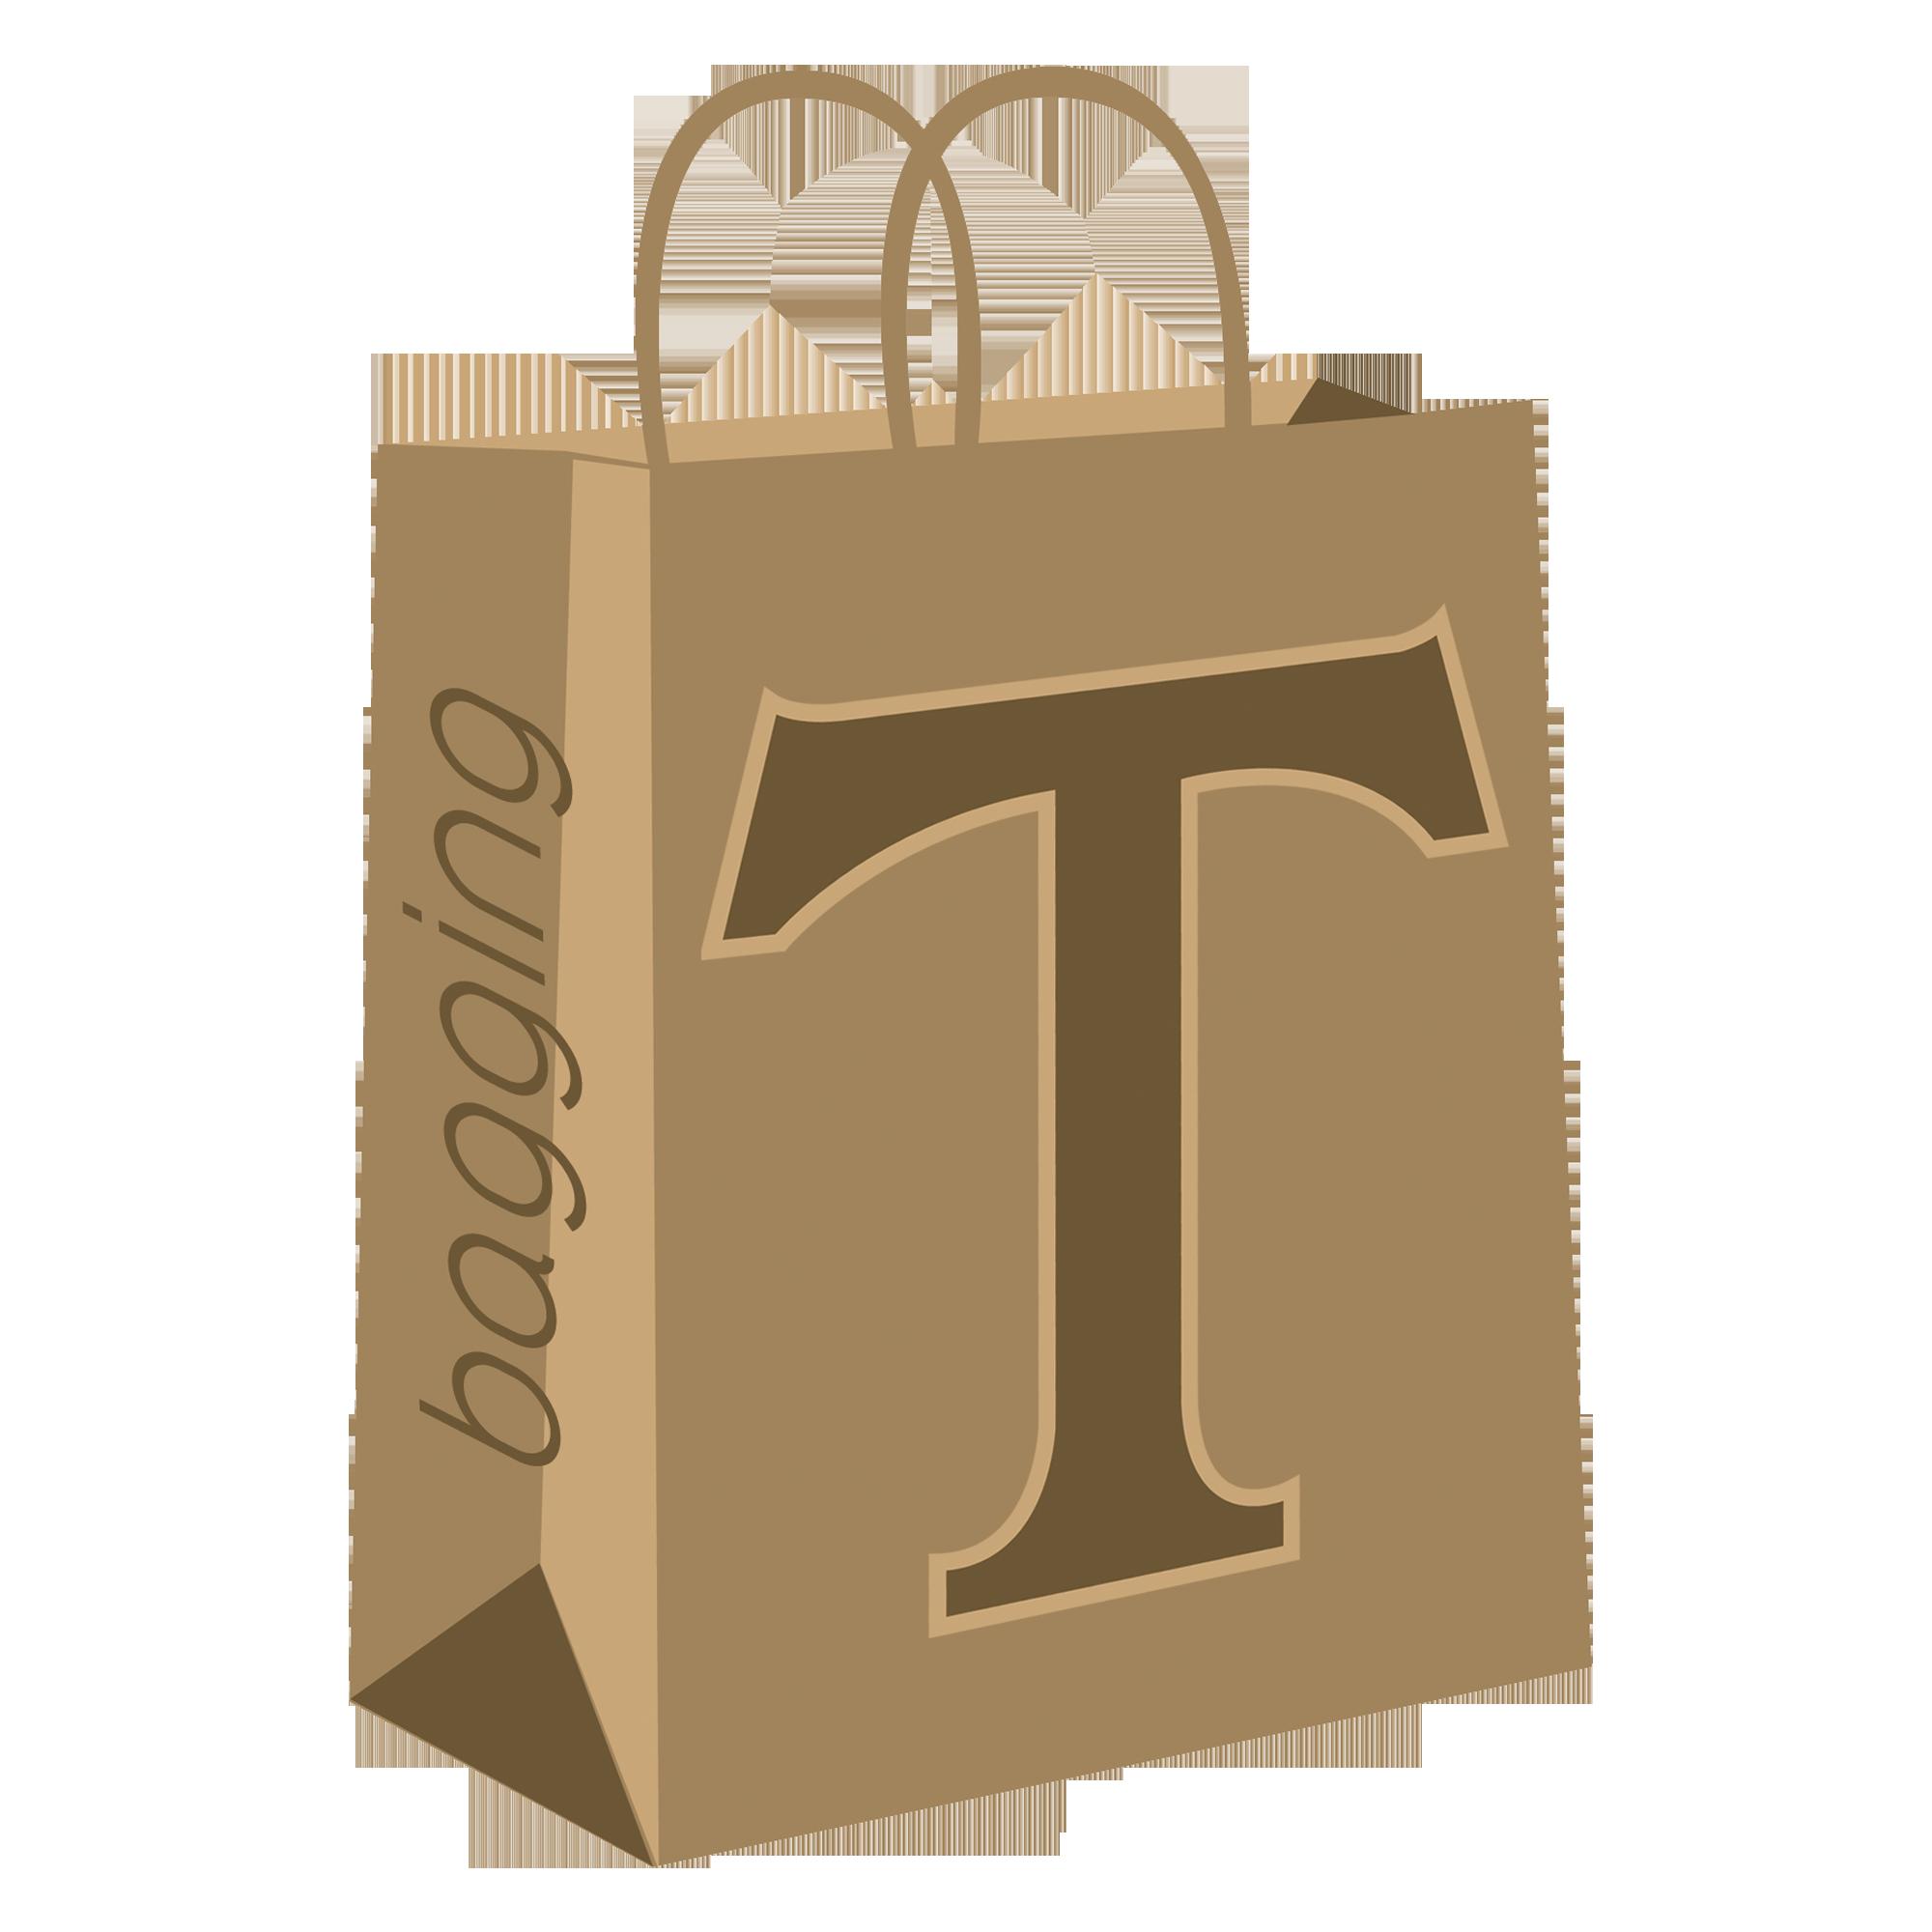 Sex T S Tea Bagging